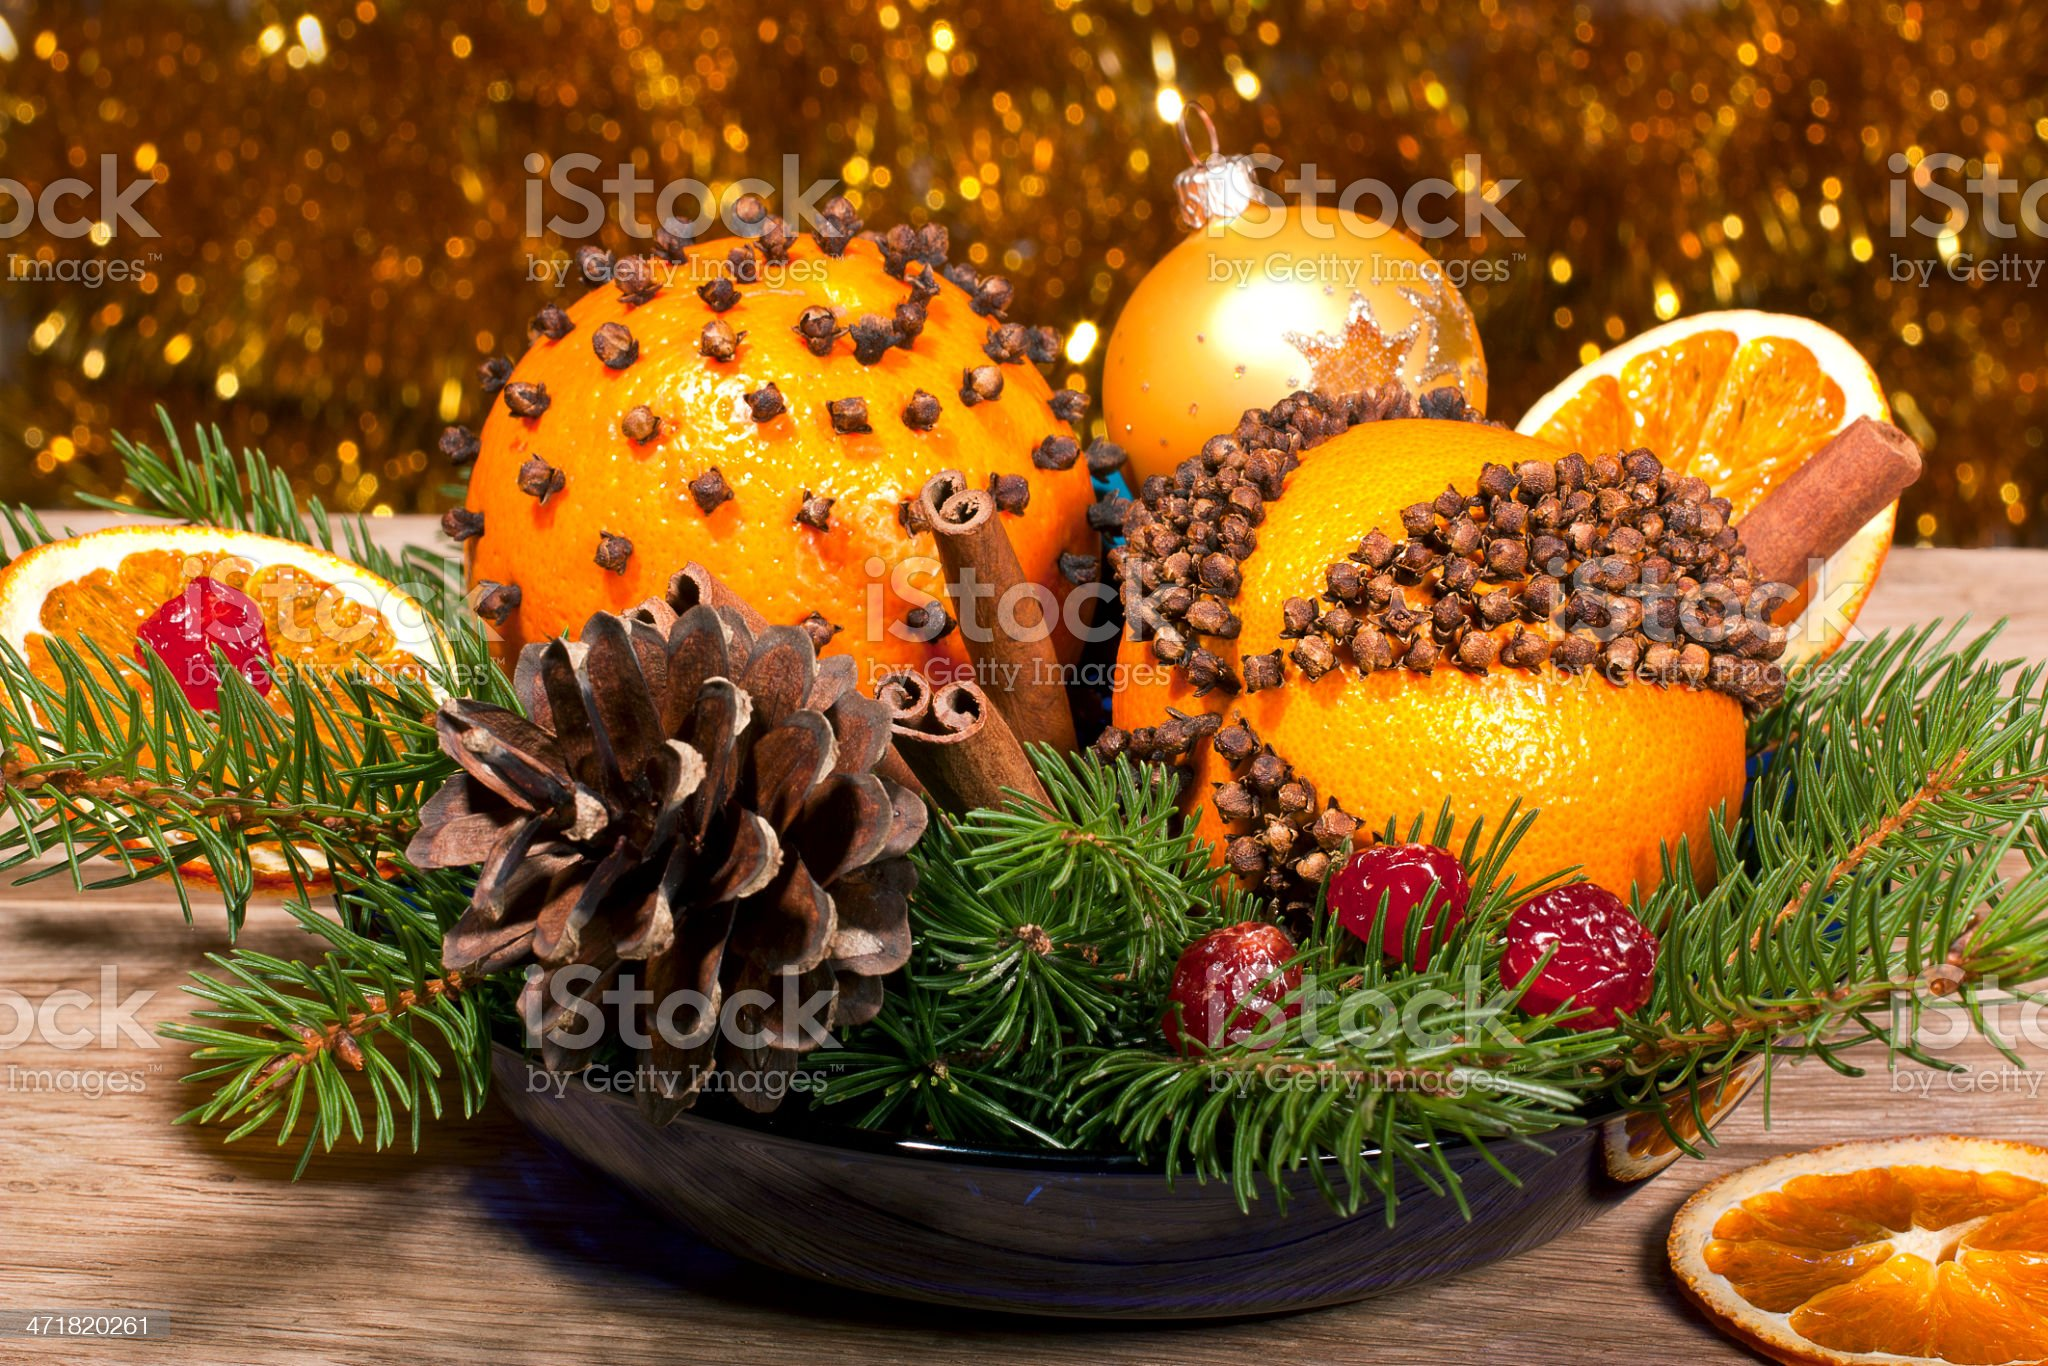 Christmas decorative composition with orange pomanders close ap royalty-free stock photo